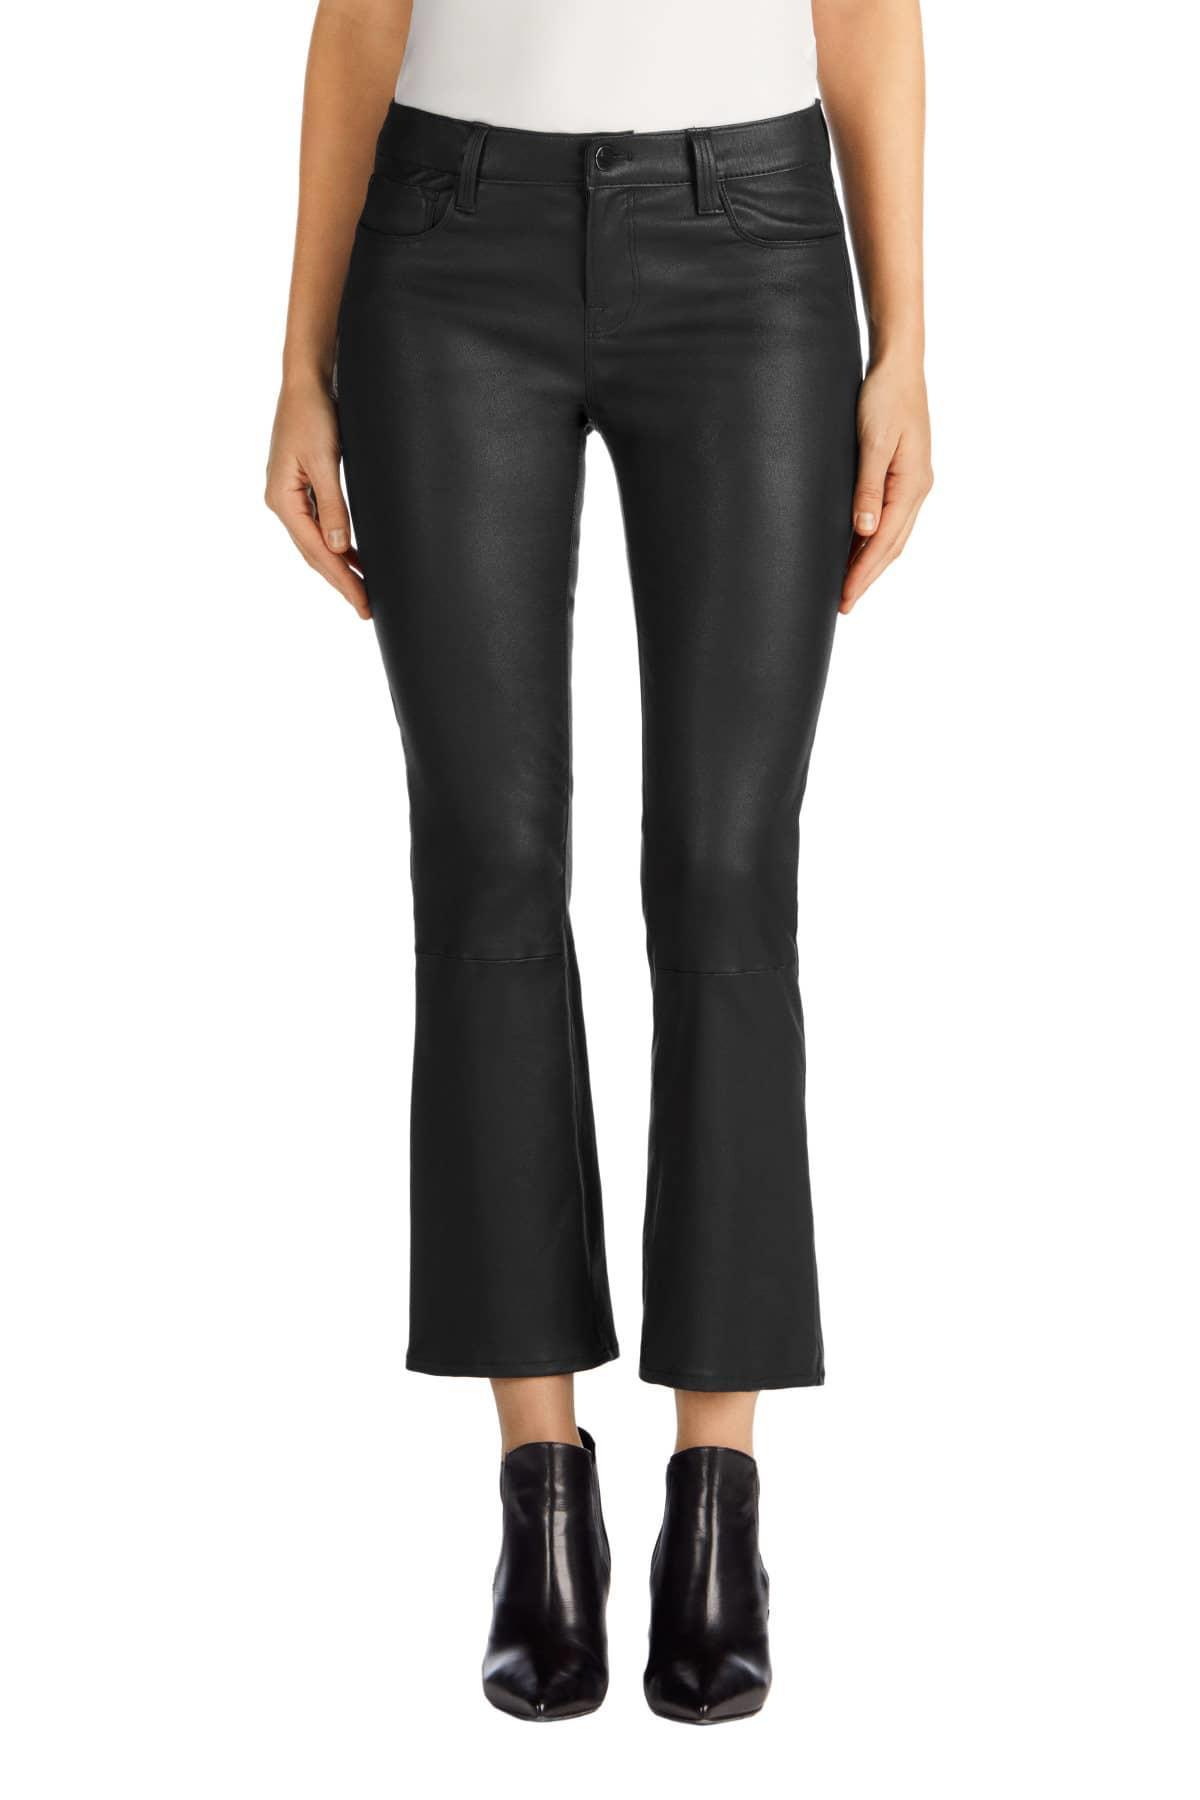 Womens Selena Corduroy Mid-Rise Skinny Crop Pants J Brand avJpkAjY8W